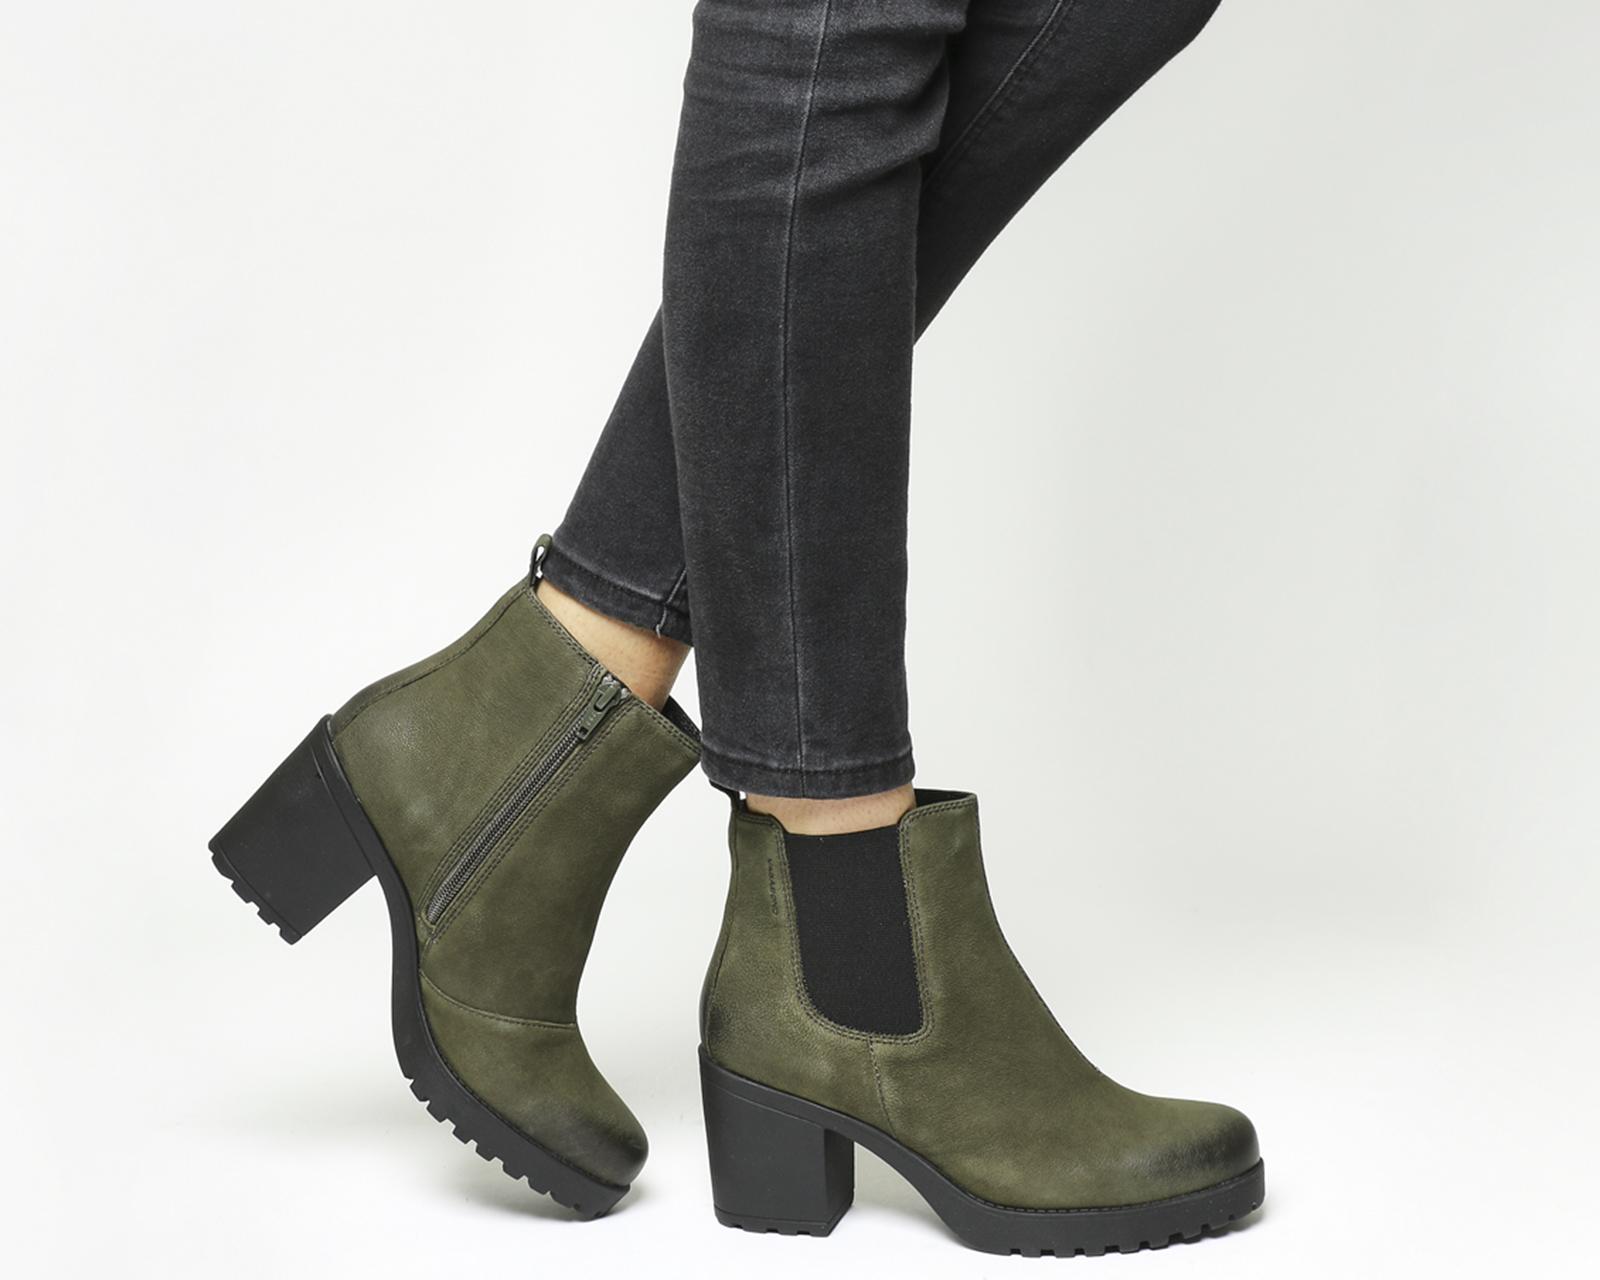 7b28cb044f73 Sentinel Womens Vagabond Grace Heeled Chelsea Boots Dark Olive Nubuck Boots